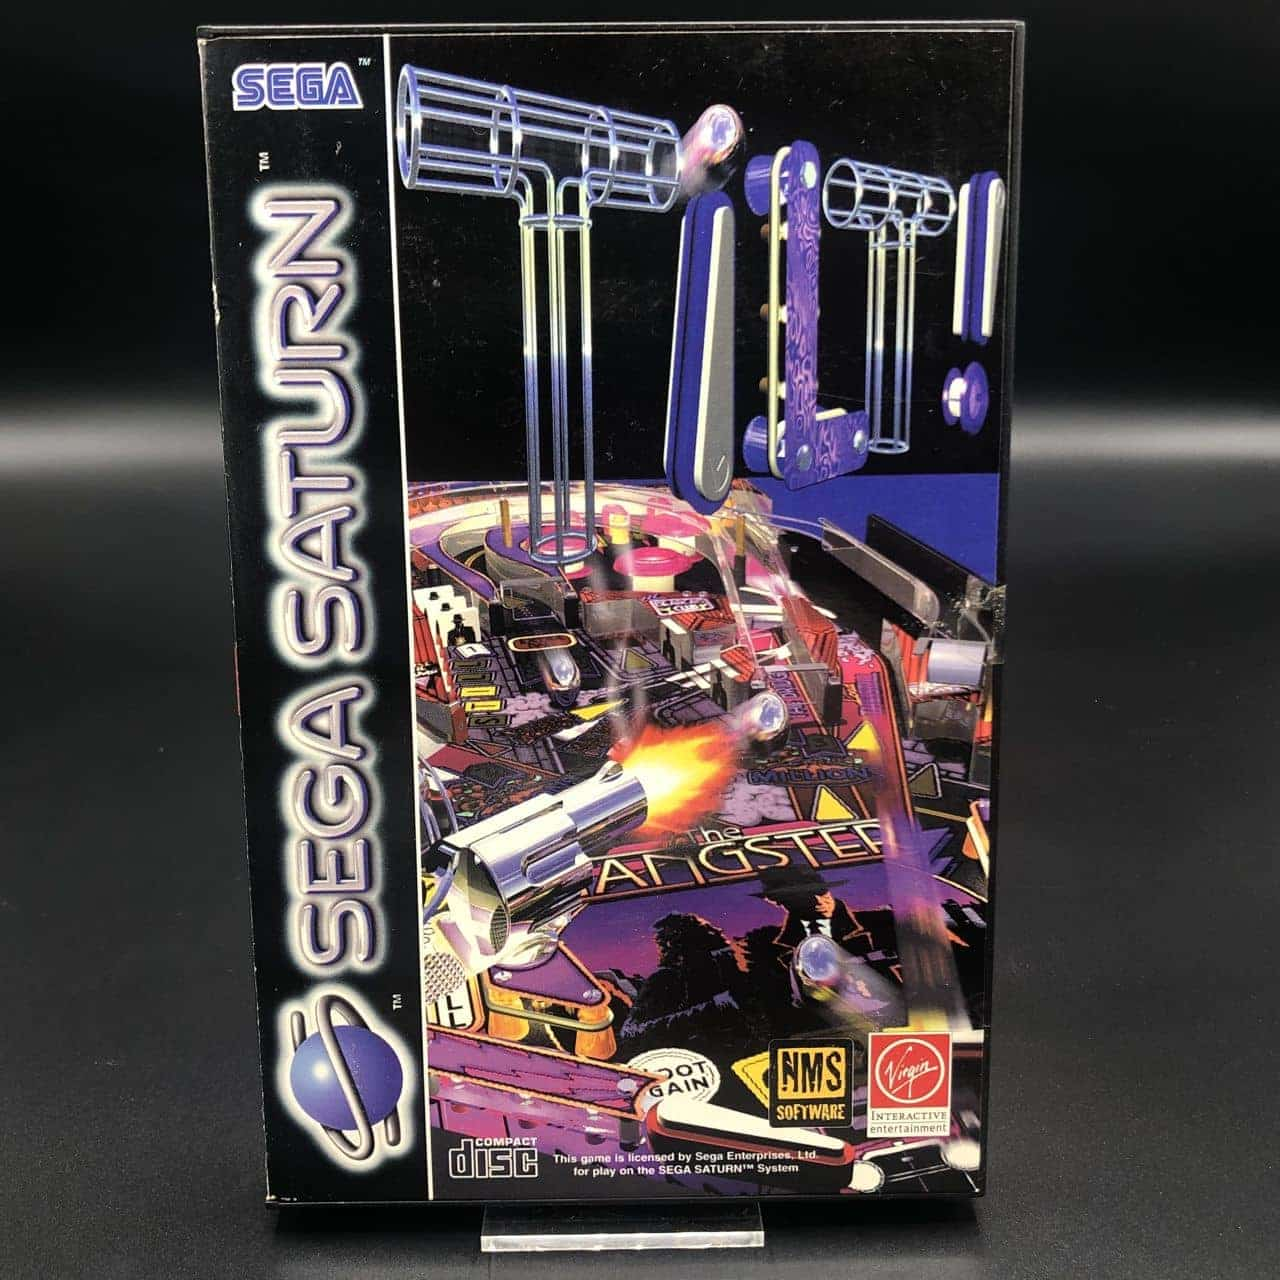 Tilt (Komplett) (Sehr gut) Sega Saturn